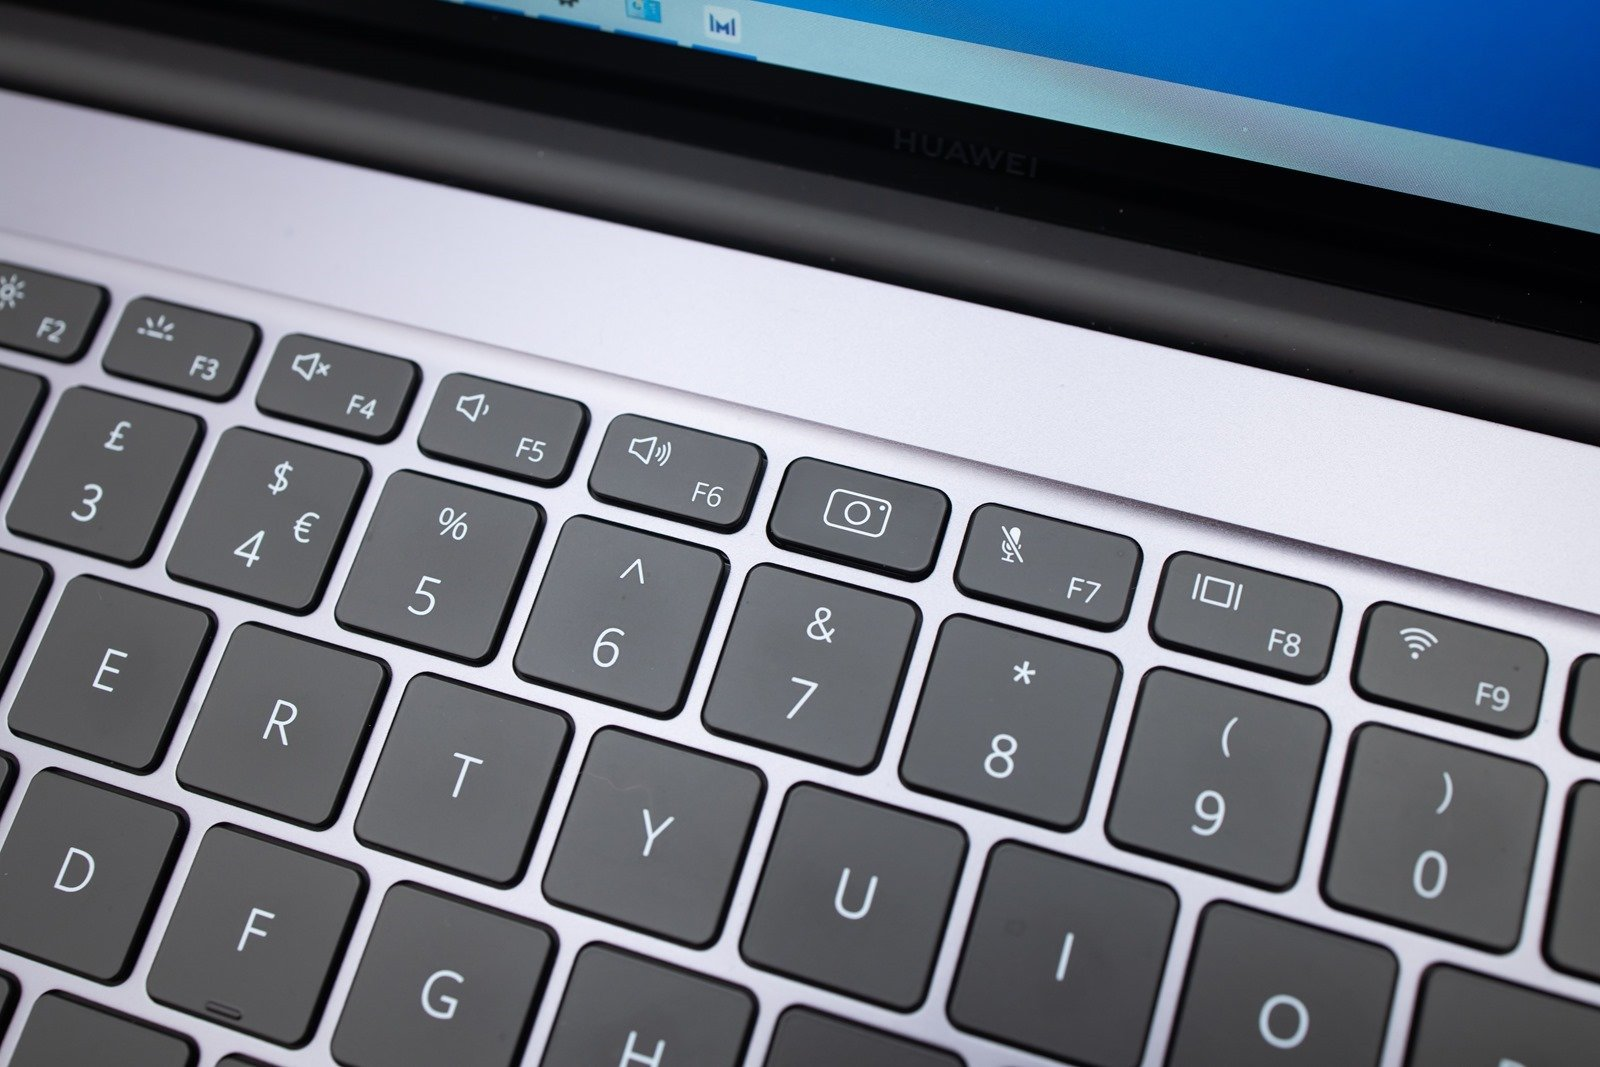 HUAWEI MateBook 14 新款開箱!更高解析度 + 更快處理器更強更快! @3C 達人廖阿輝